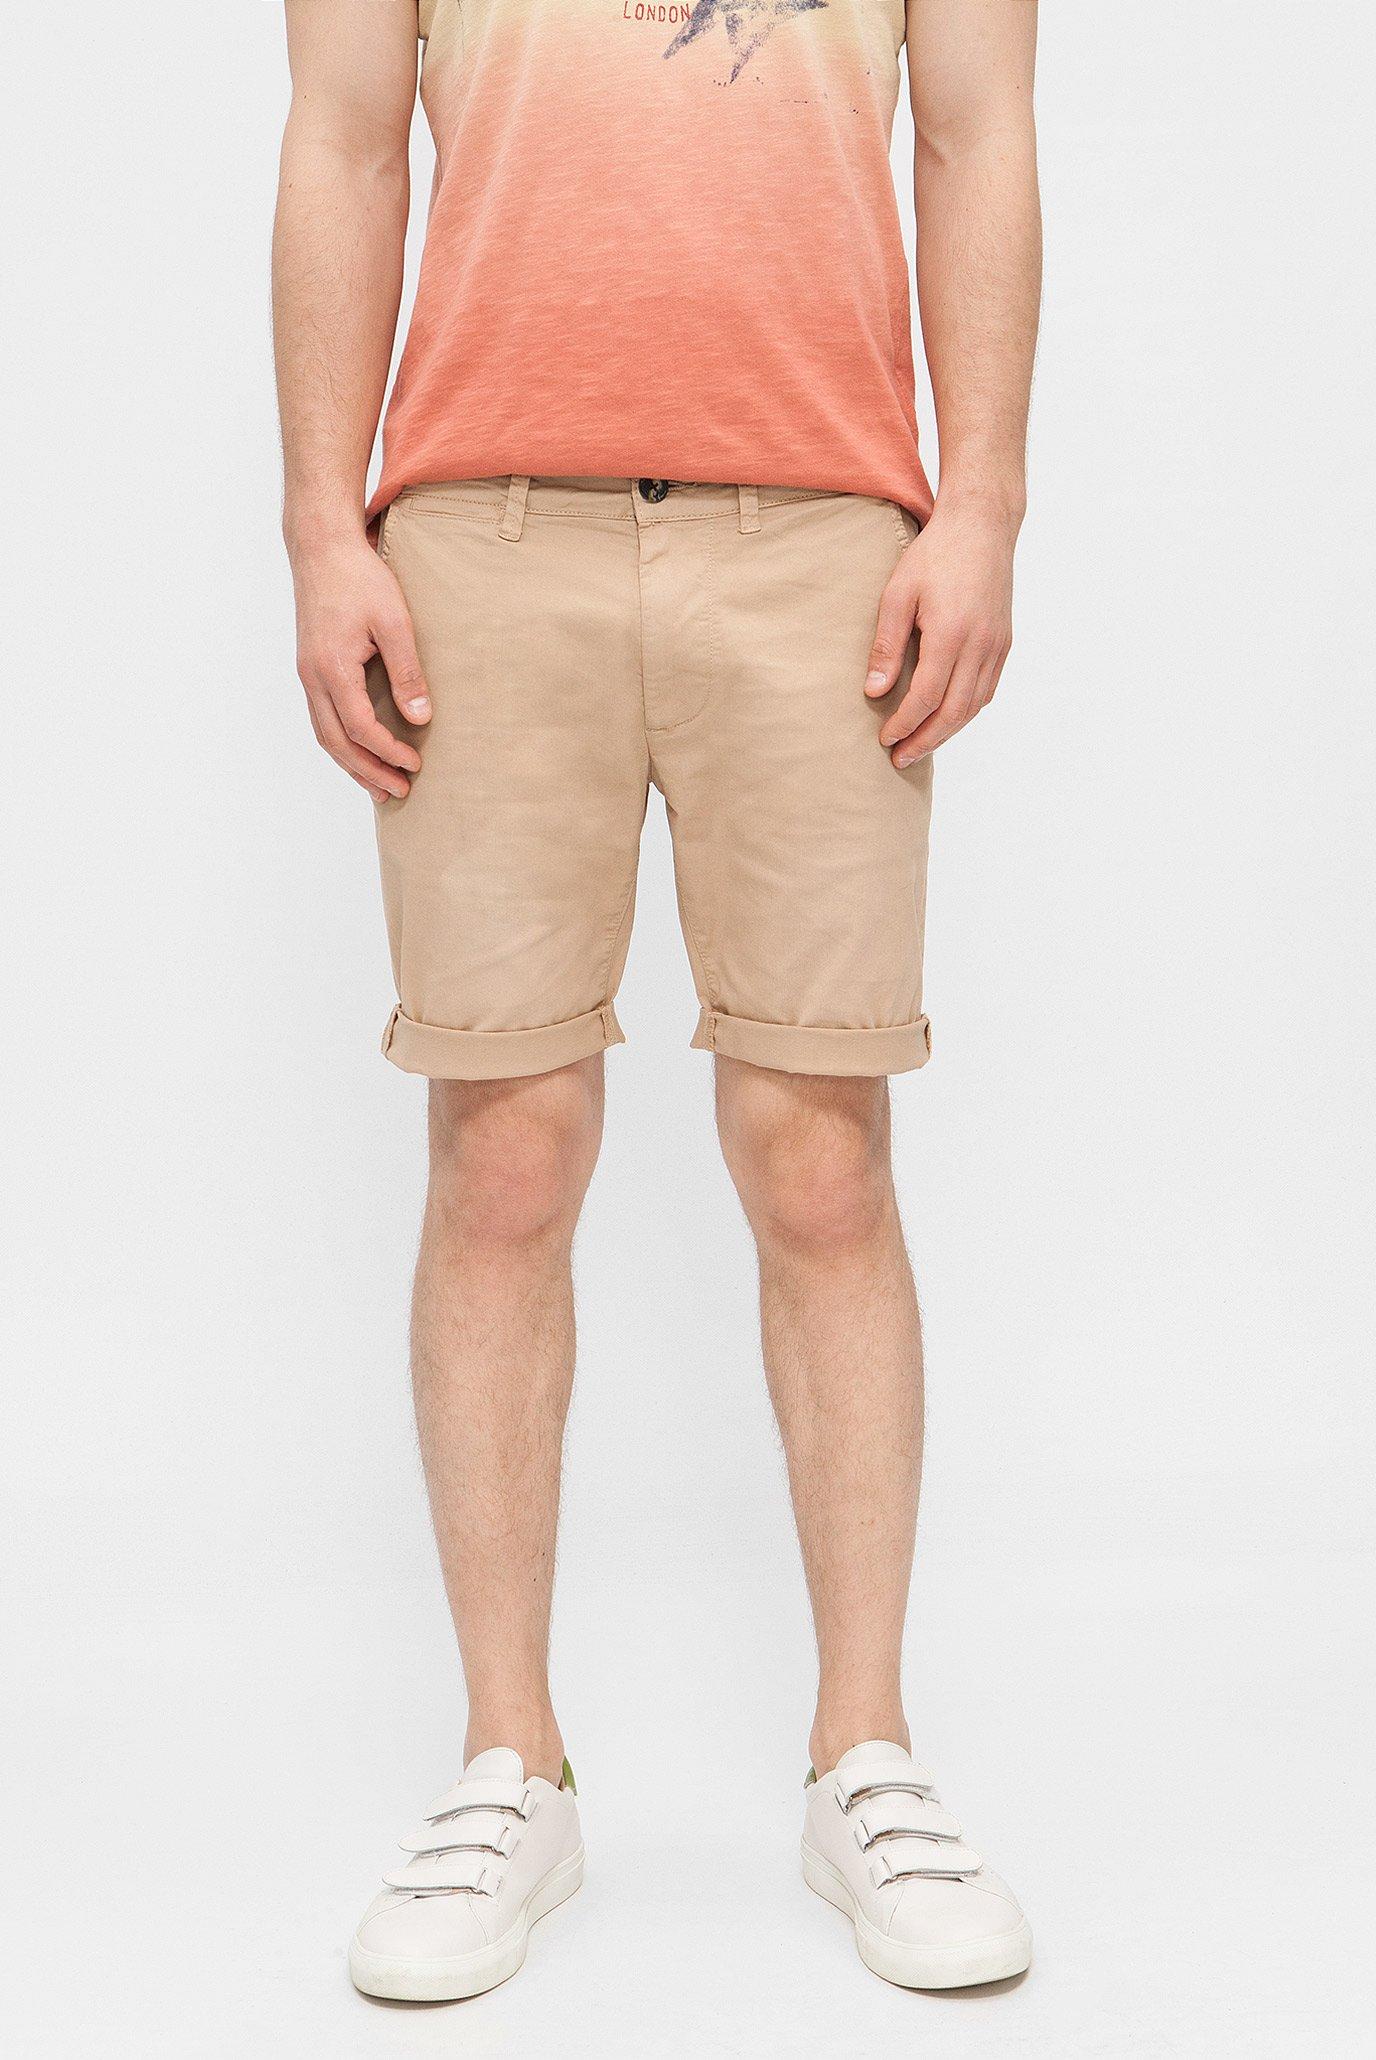 fe5bf02e992 Купить Мужские светло-коричневые шорты QUEEN SHORT Pepe Jeans Pepe Jeans  PM800227C75 – Киев